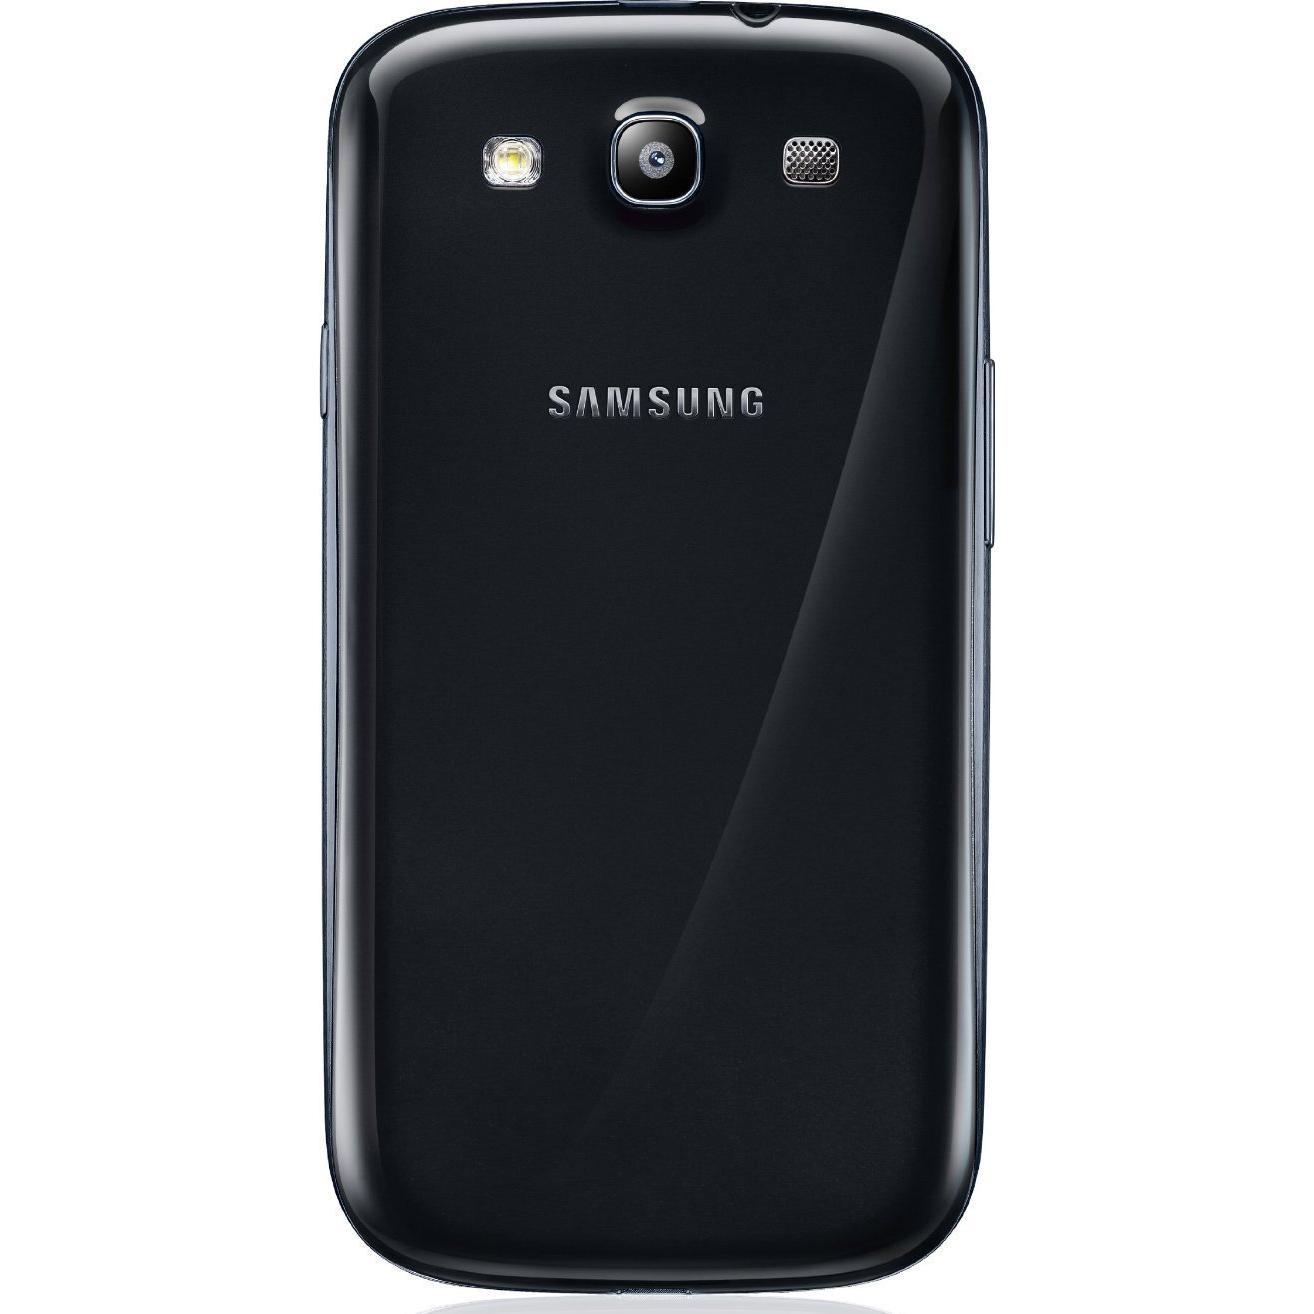 Samsung Galaxy S3 16 Gb i9305 4G - Negro - Libre